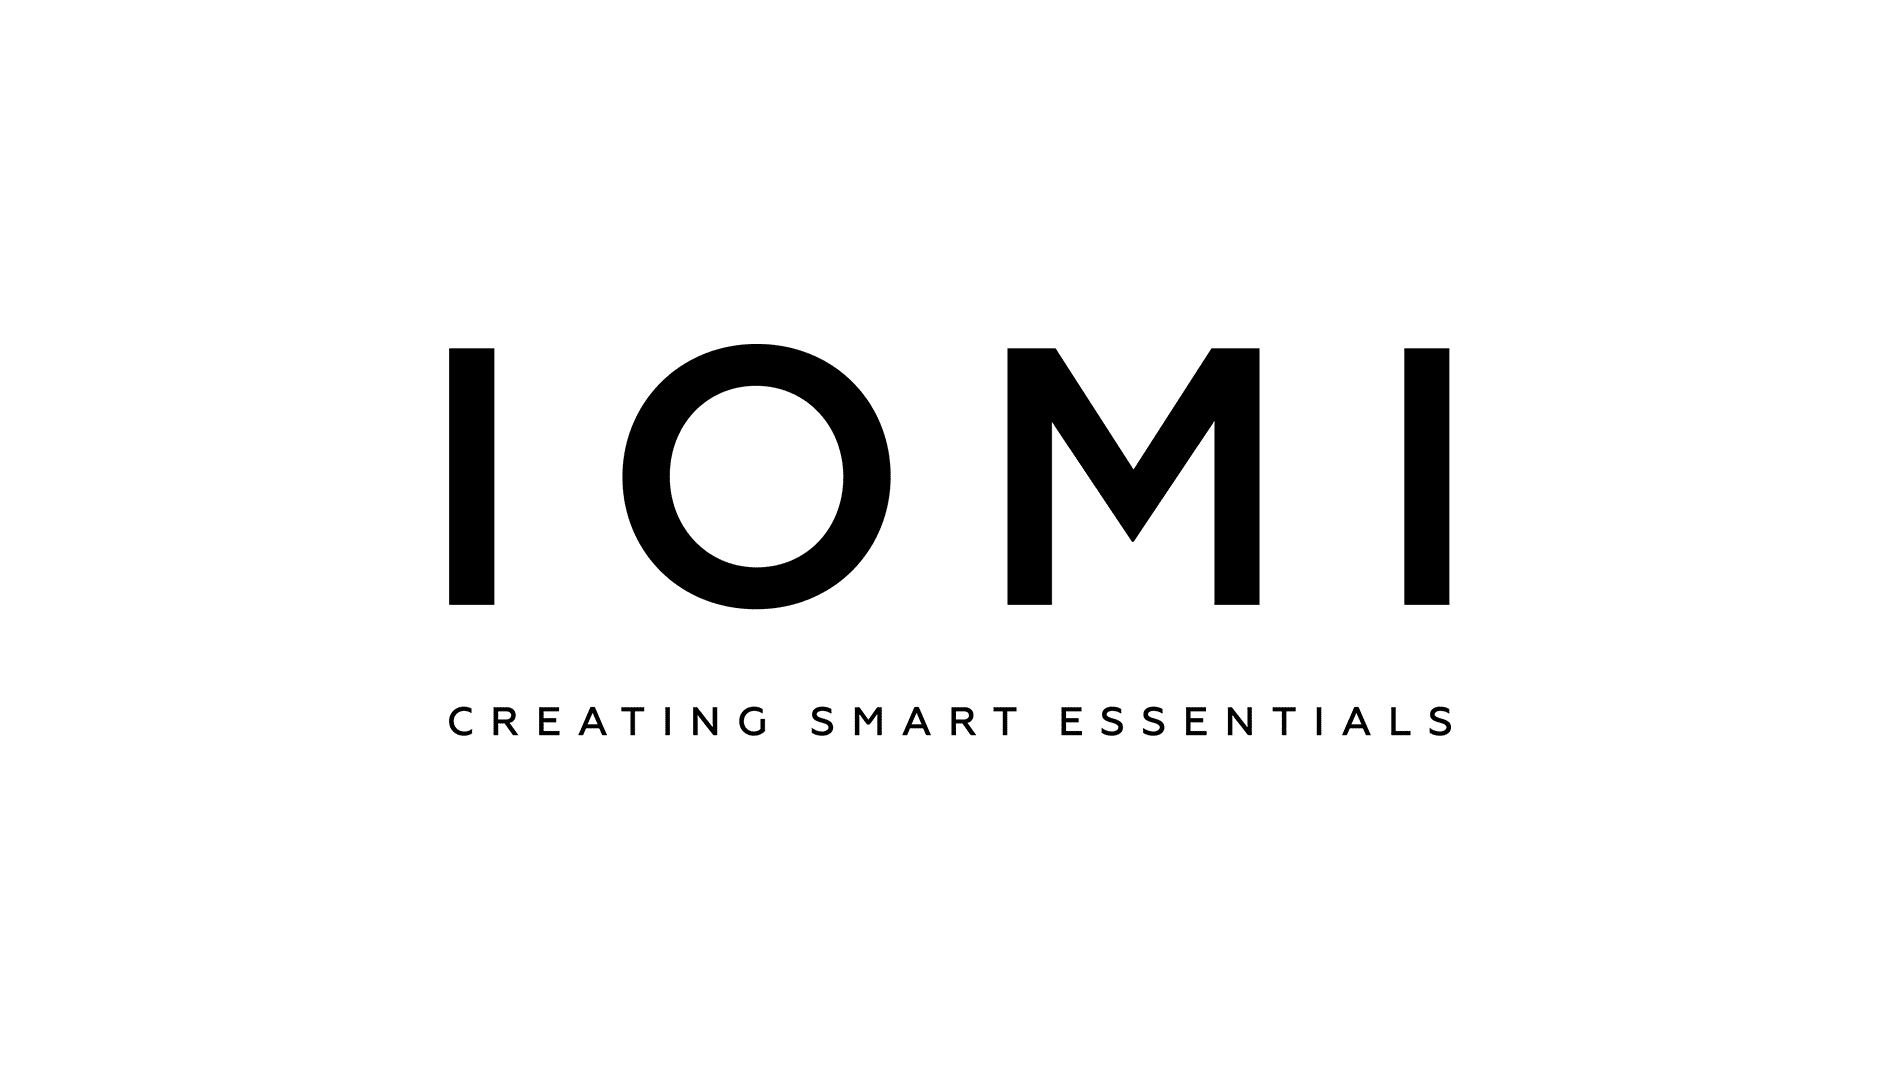 Logo-iomi